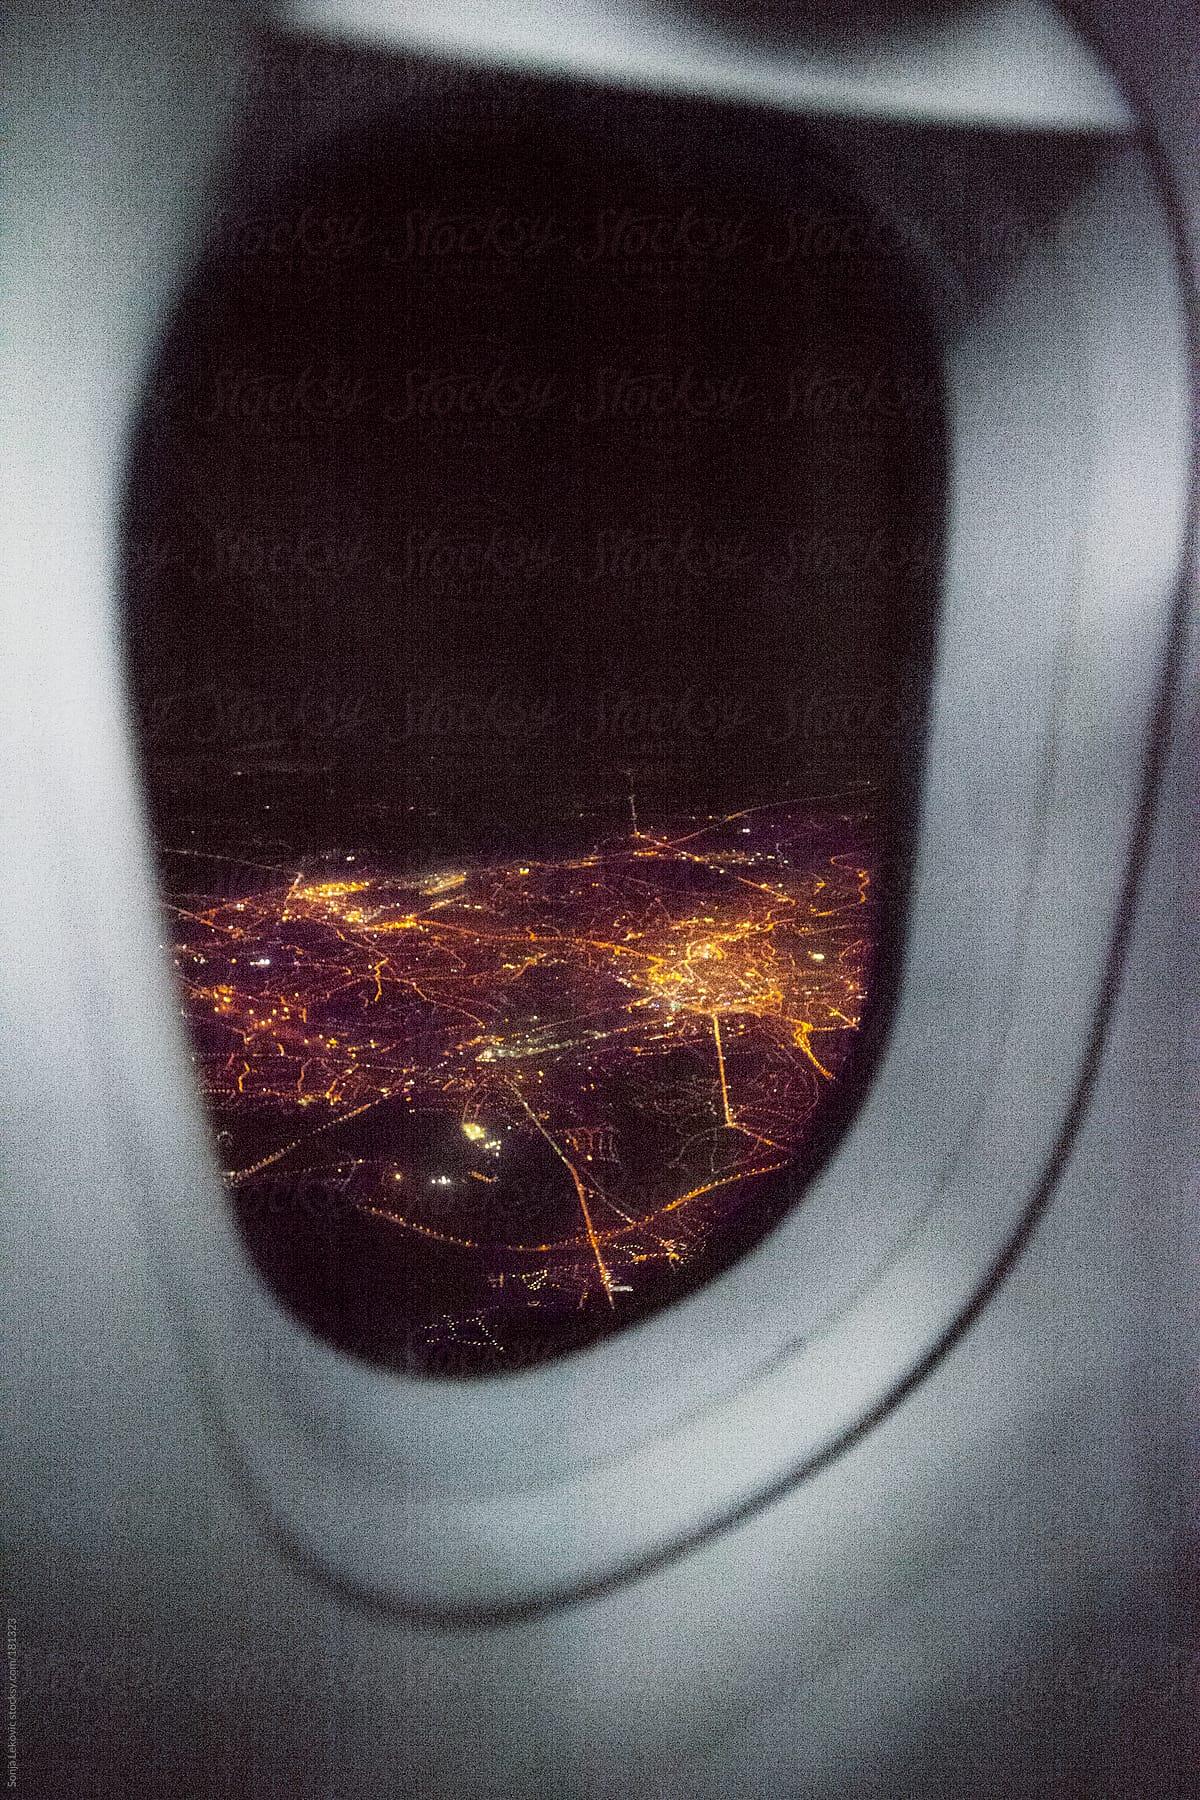 City Lights At Night Through An Airplane Window By Sonja Lekovic